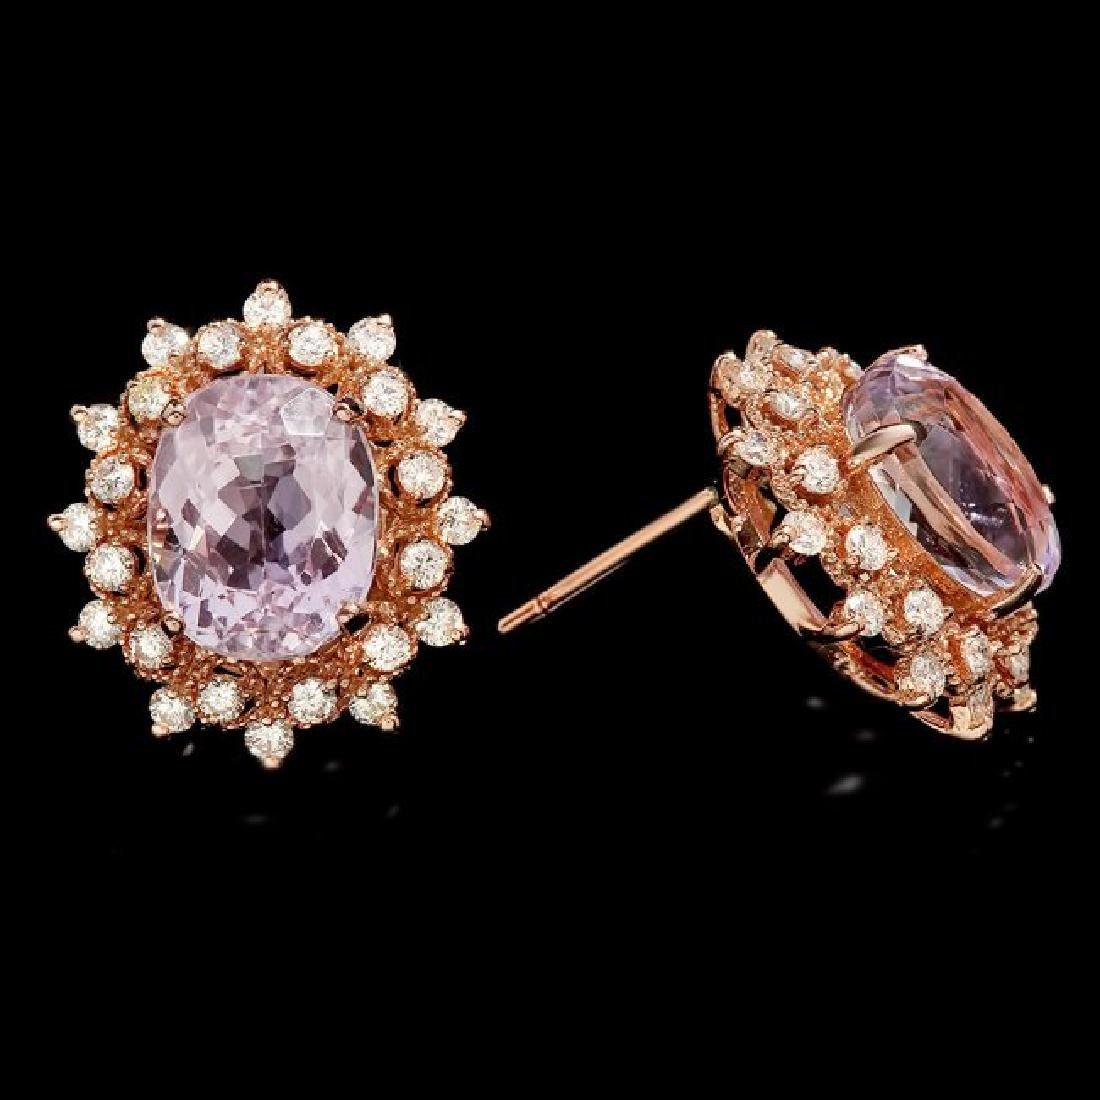 14k Rose 10.00ct Kunzite 1.35ct Diamond Earrings - 3